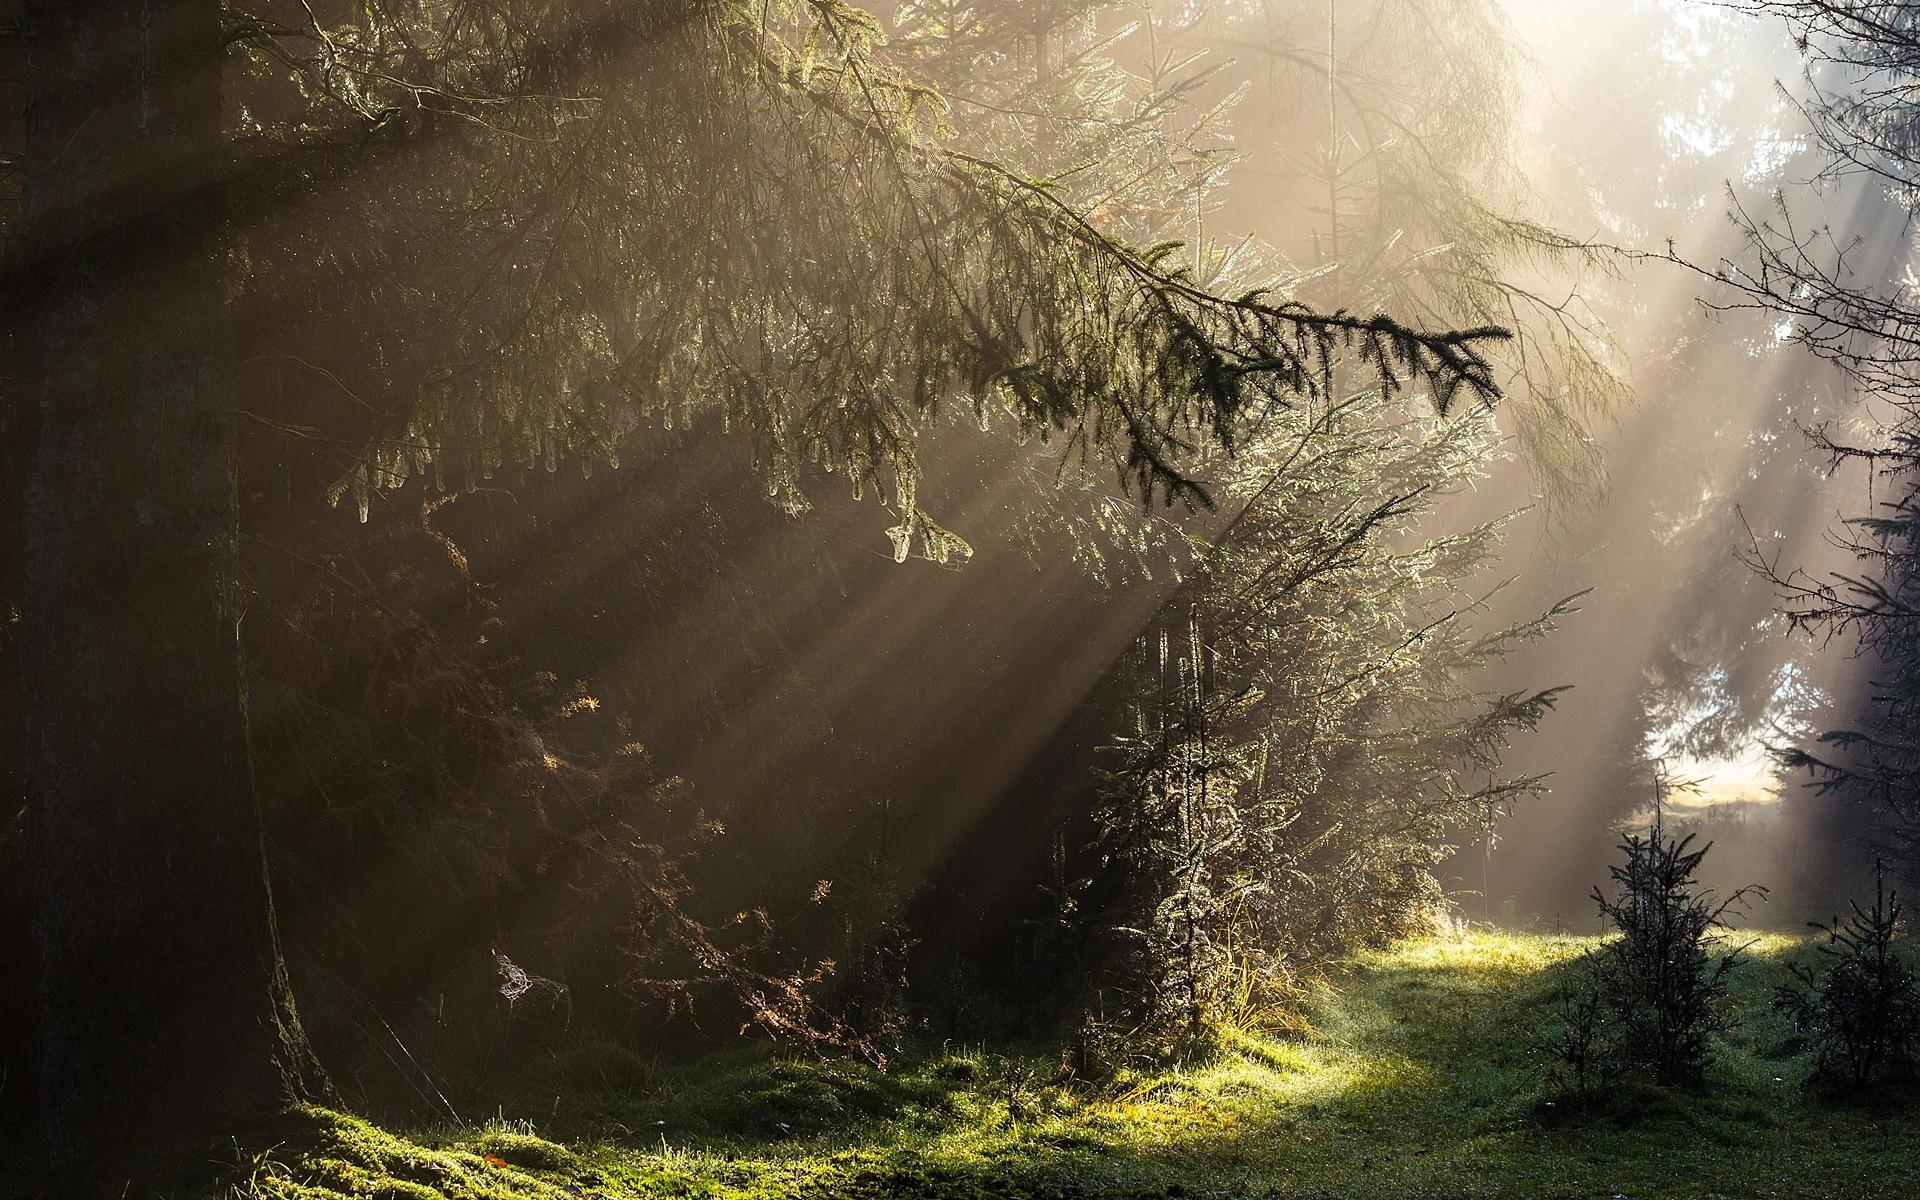 Sunbeam Landscape